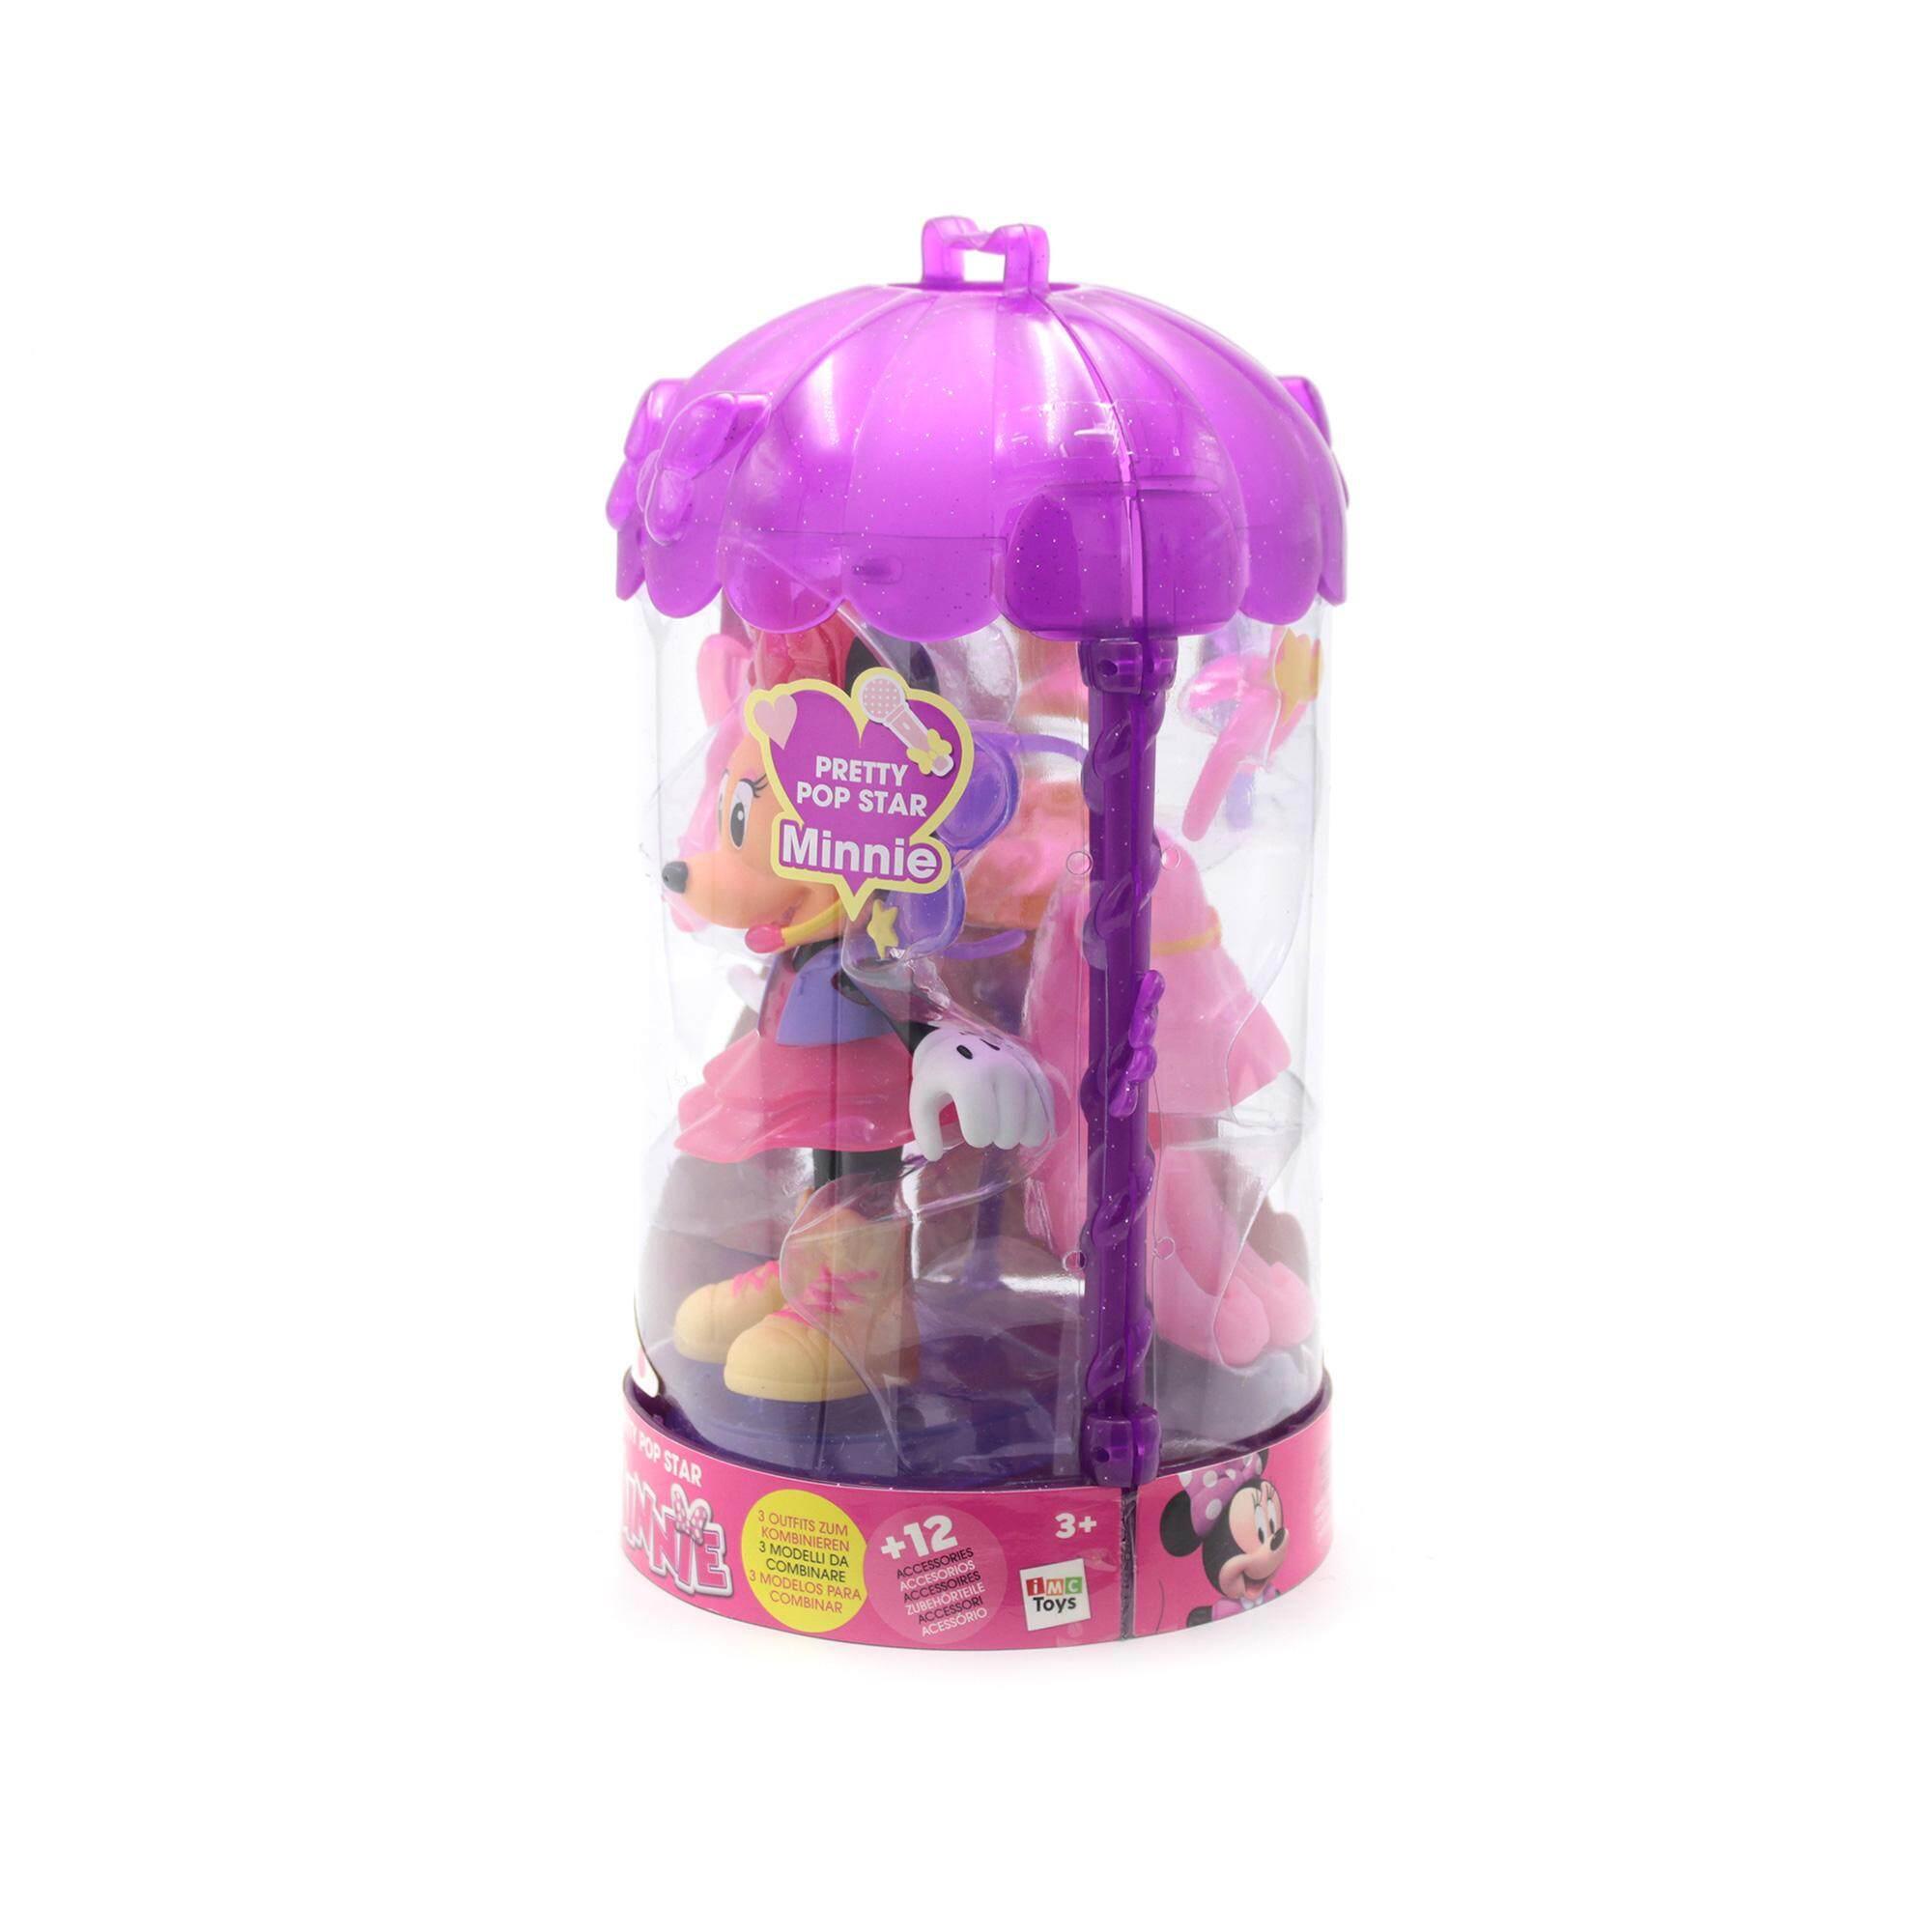 Disney Minnie Pretty Pop Star Accessories